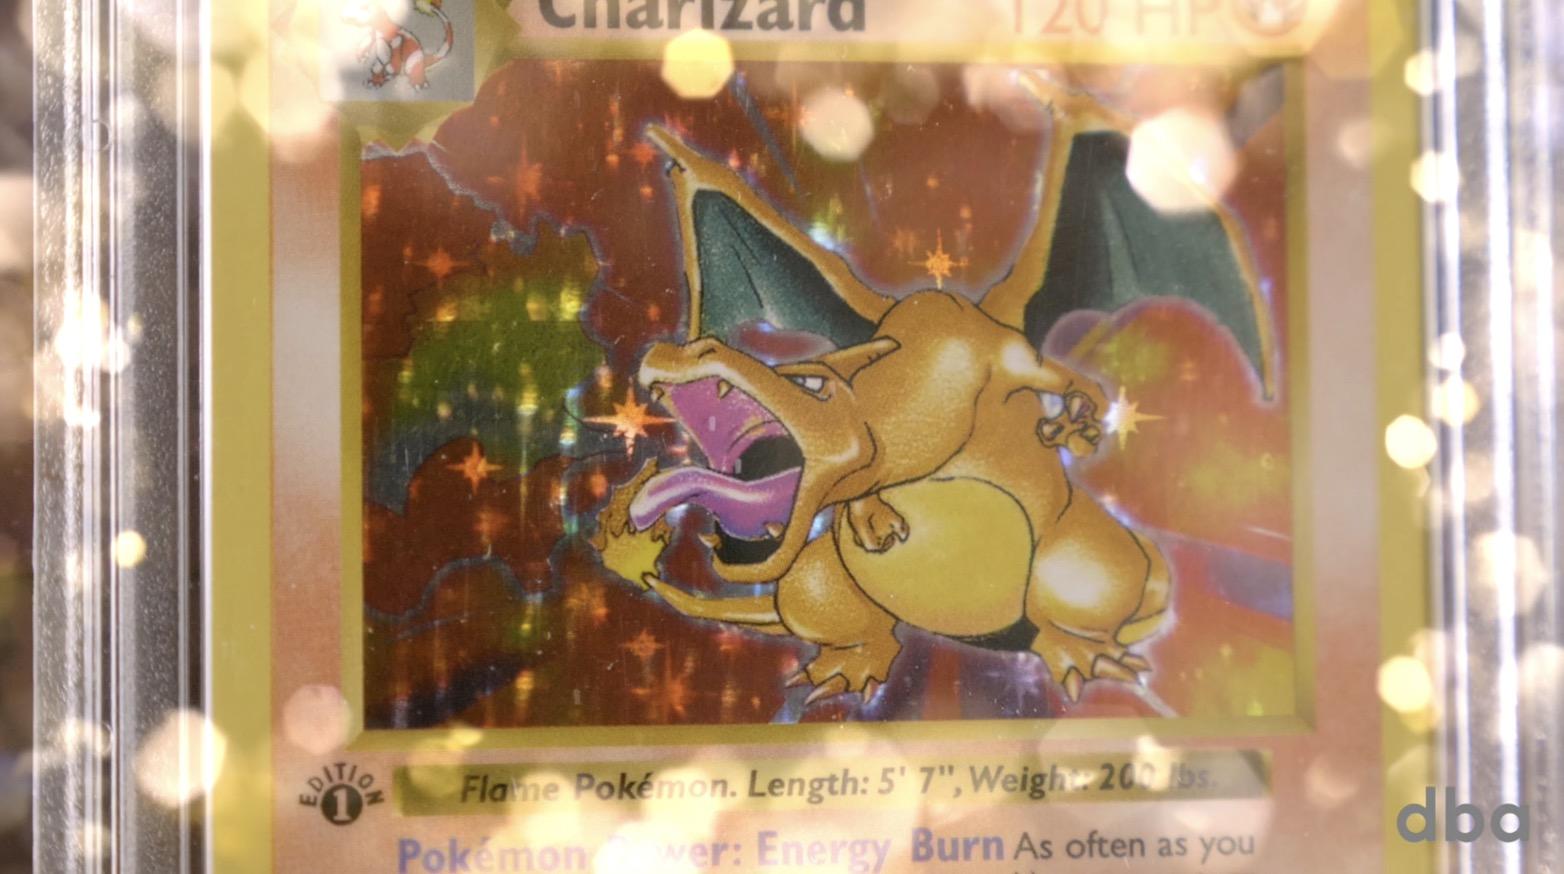 Dyreste Pokémonkort